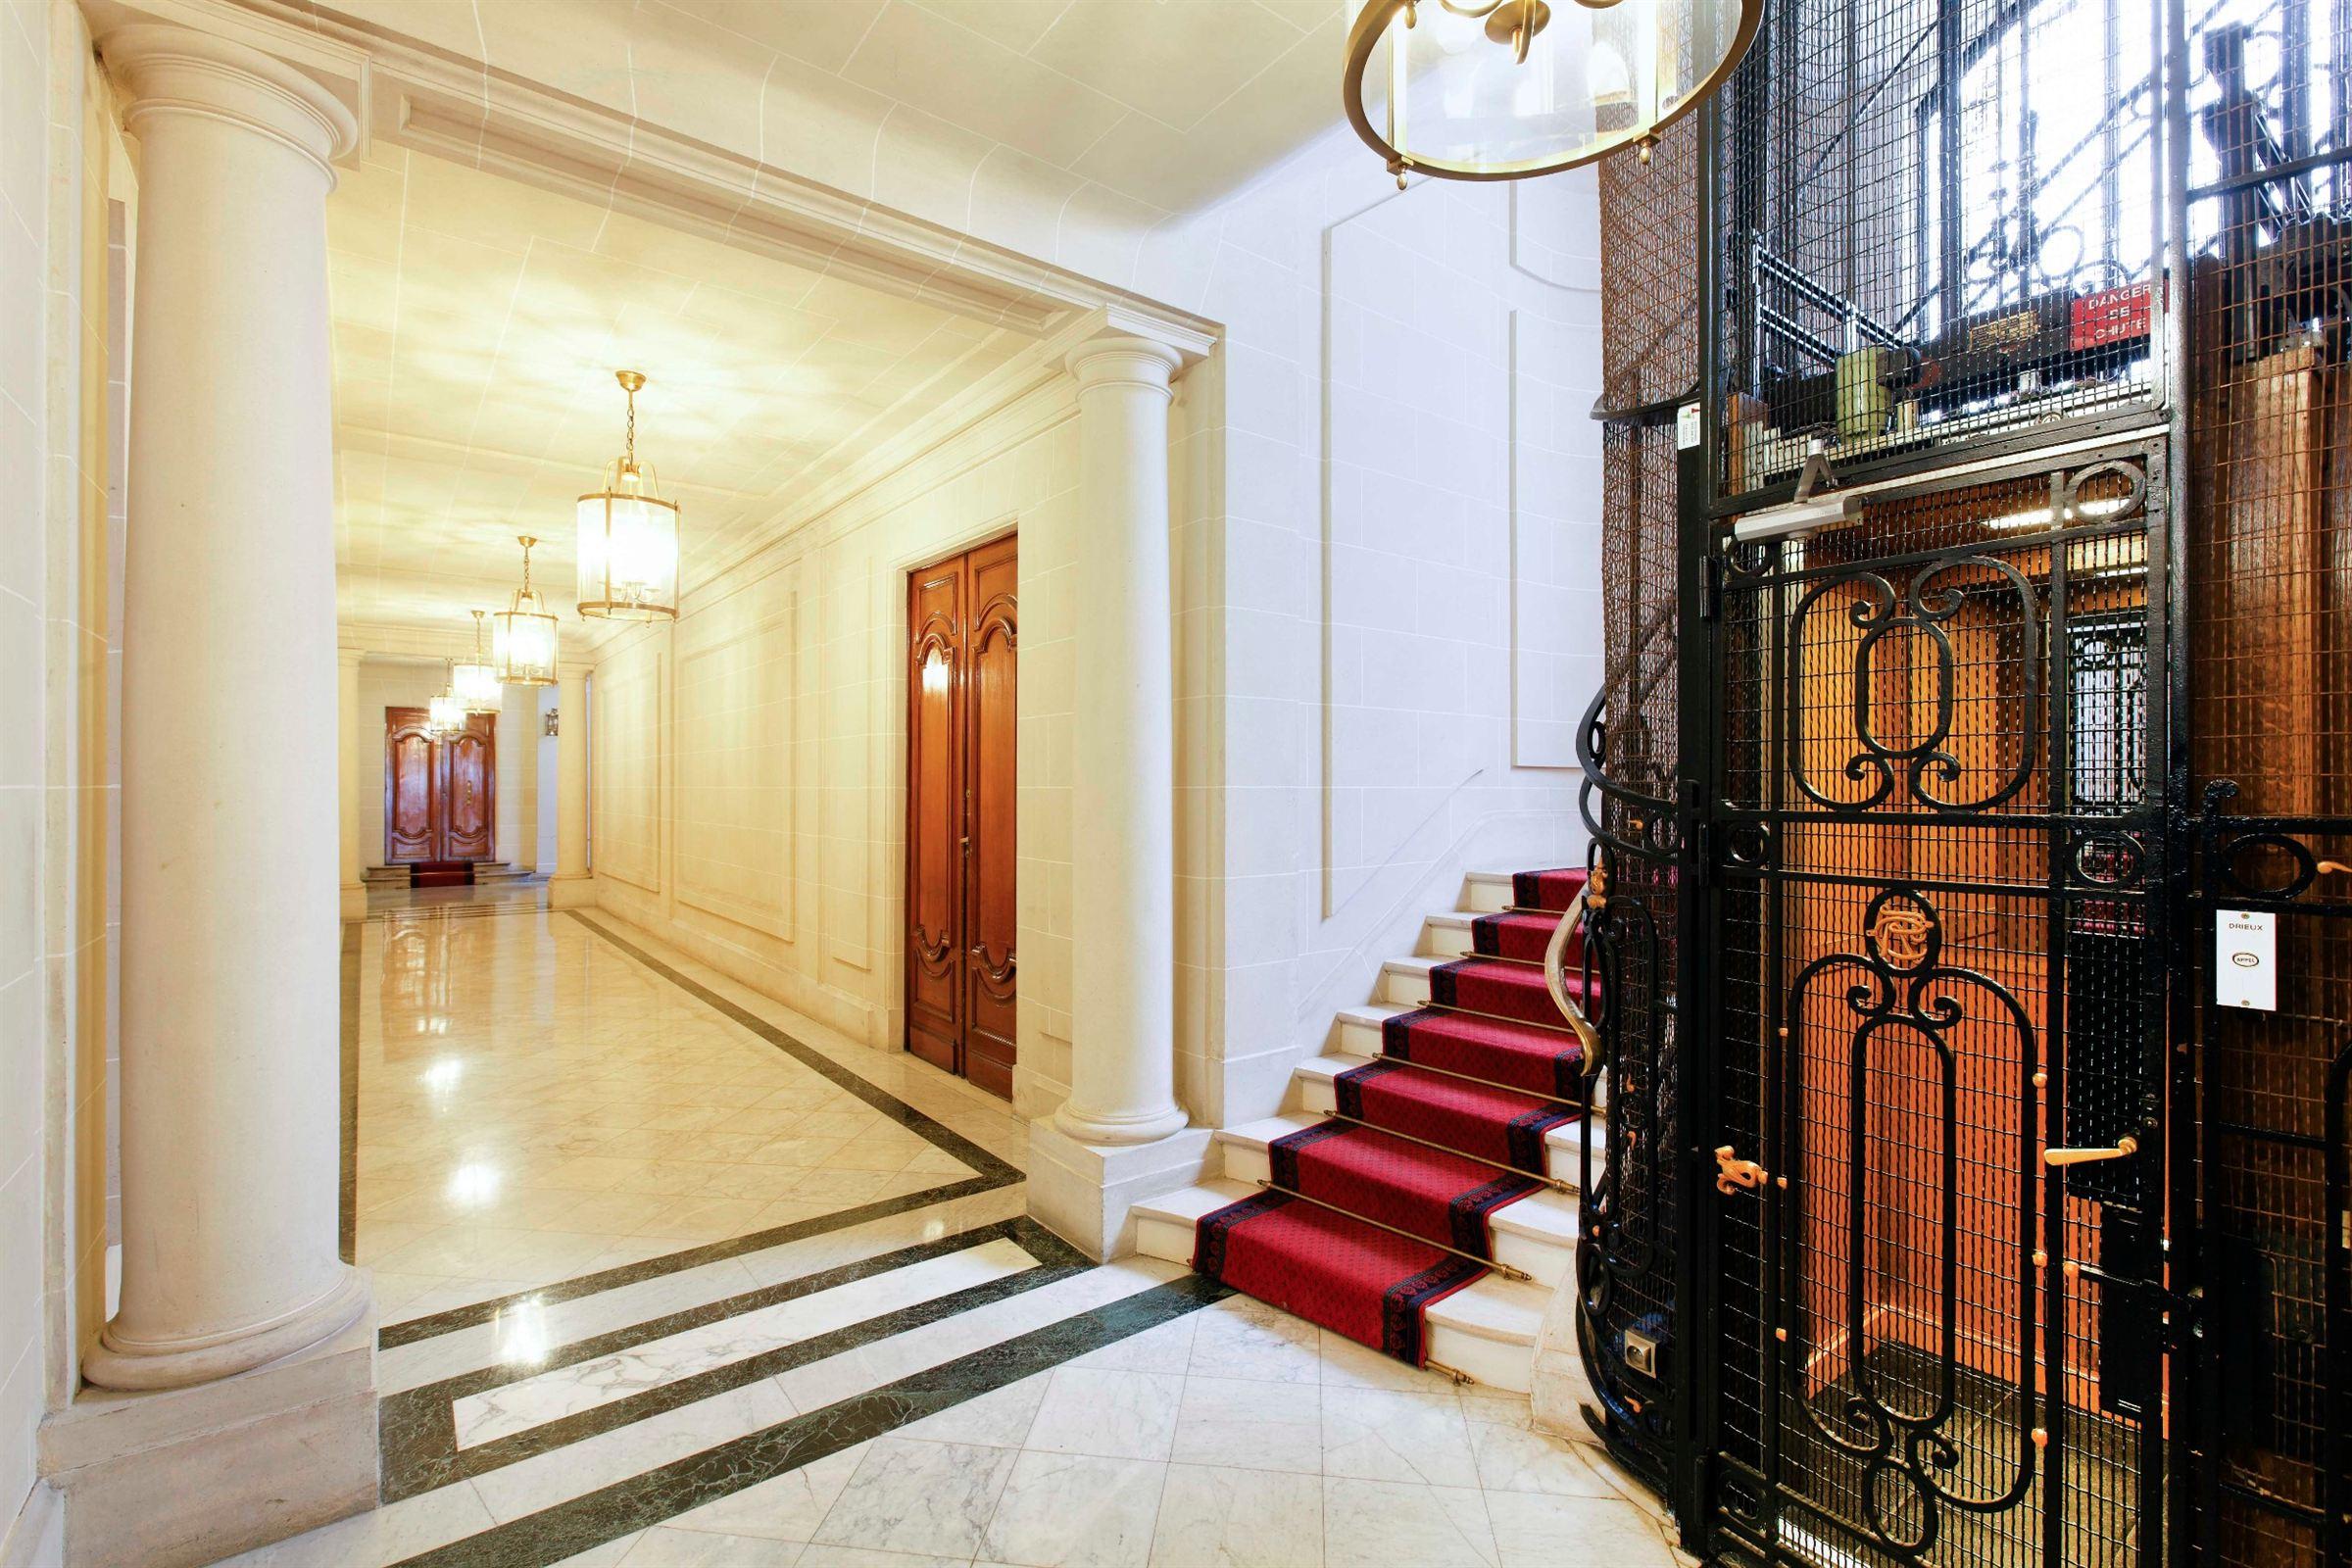 Appartamento per Vendita alle ore Apartment - Bd Malesherbes Paris, Parigi 75017 Francia